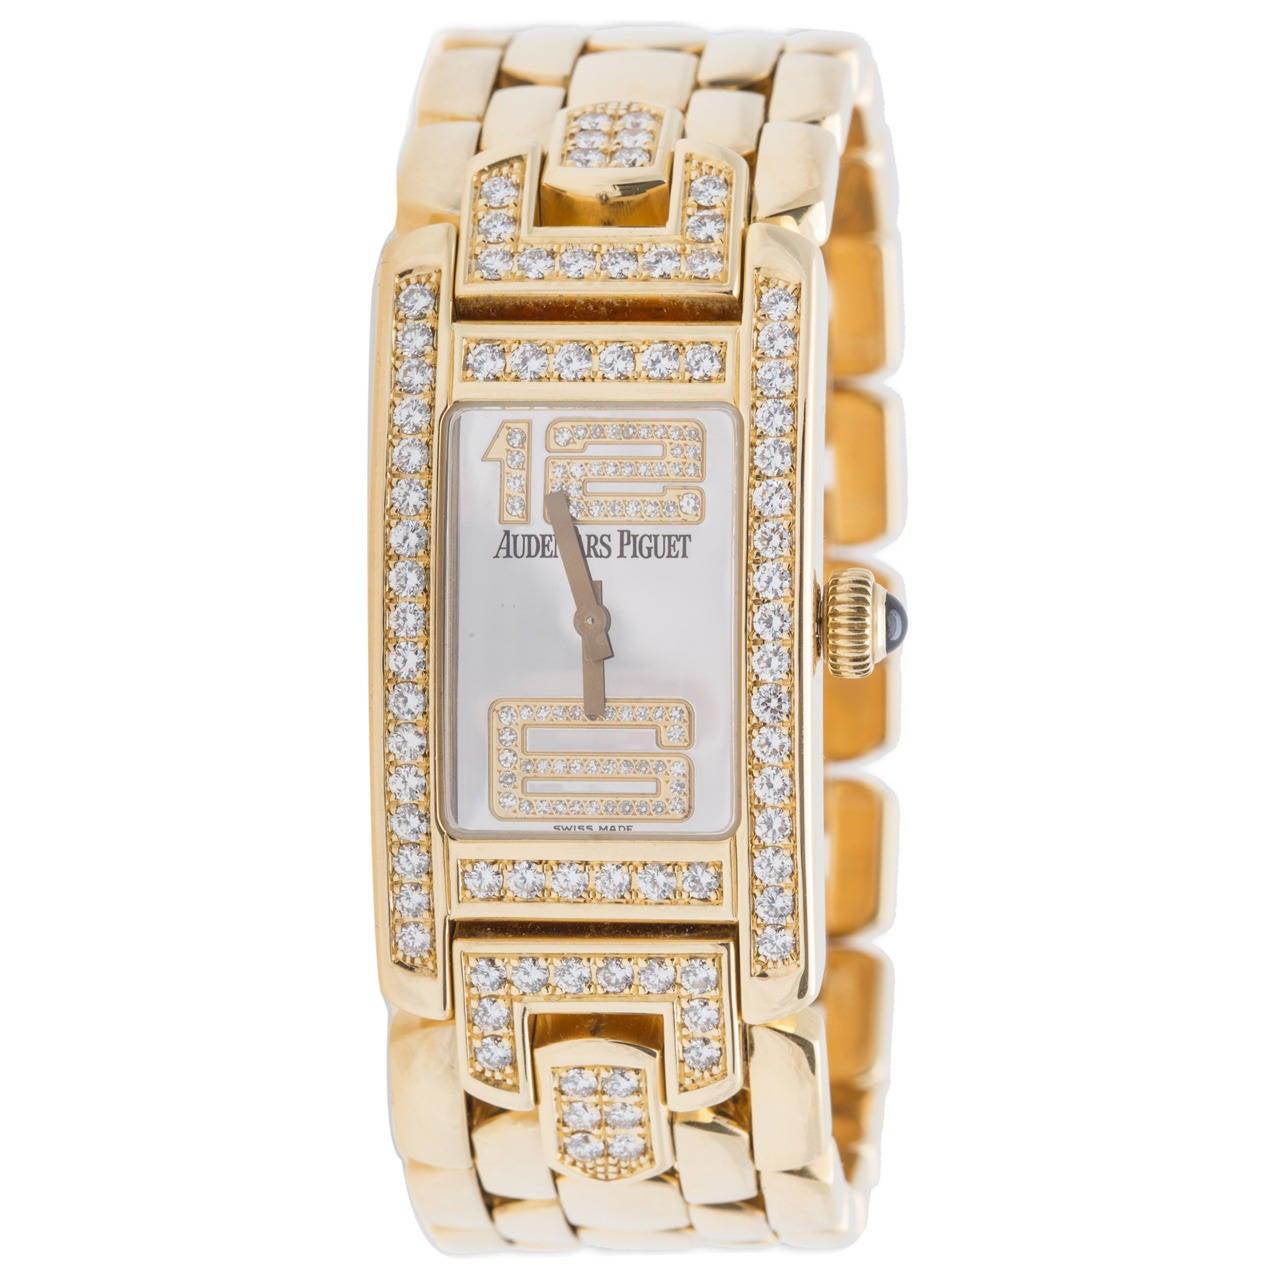 Audemars Piguet Ladies Yellow Gold and Diamond Promesse Quartz Wristwatch